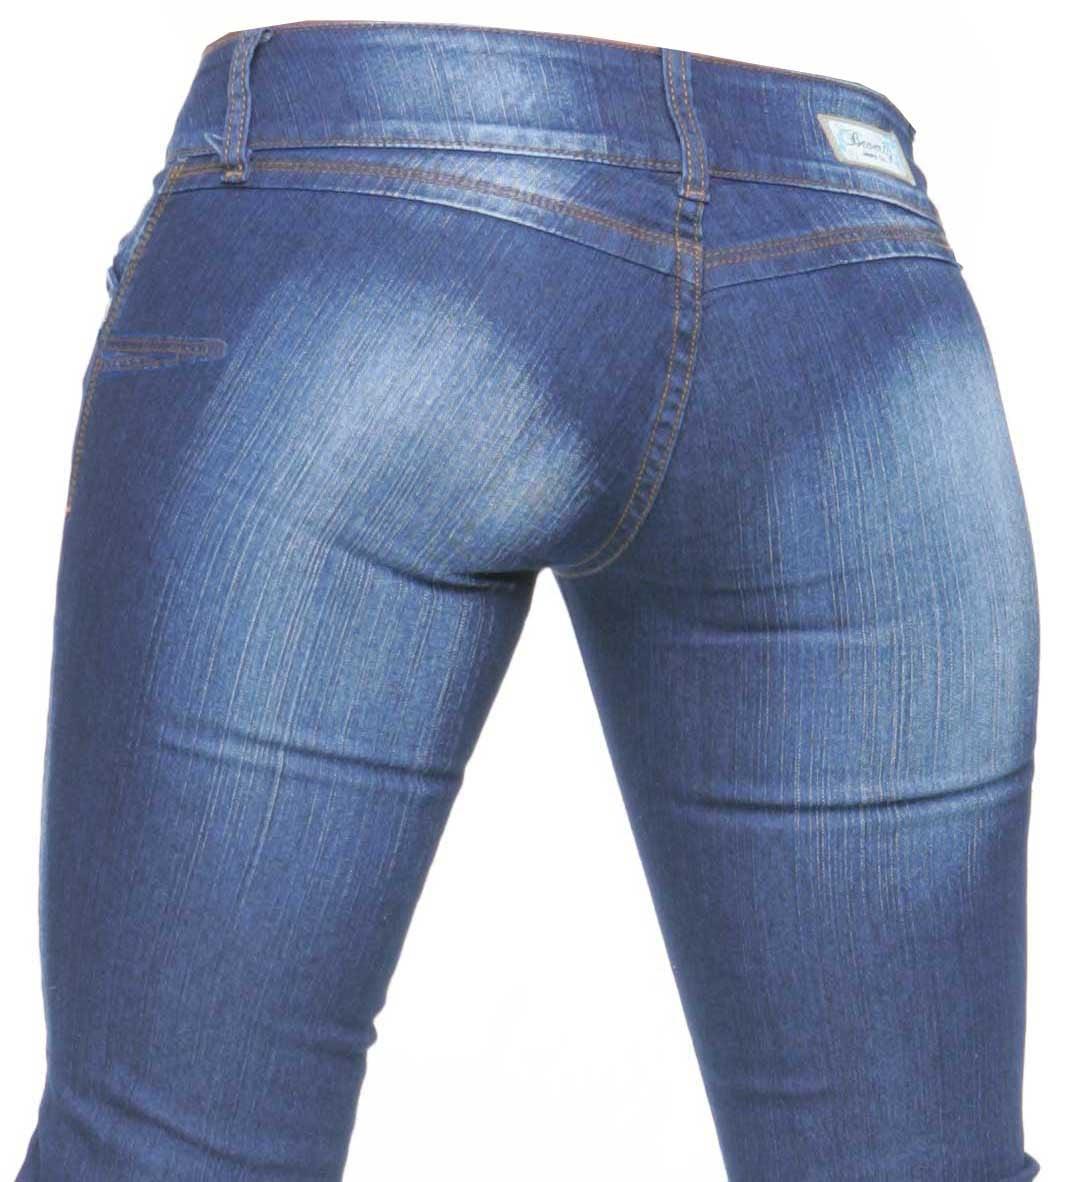 Jeans-Back-Pockets.JPG.jpg